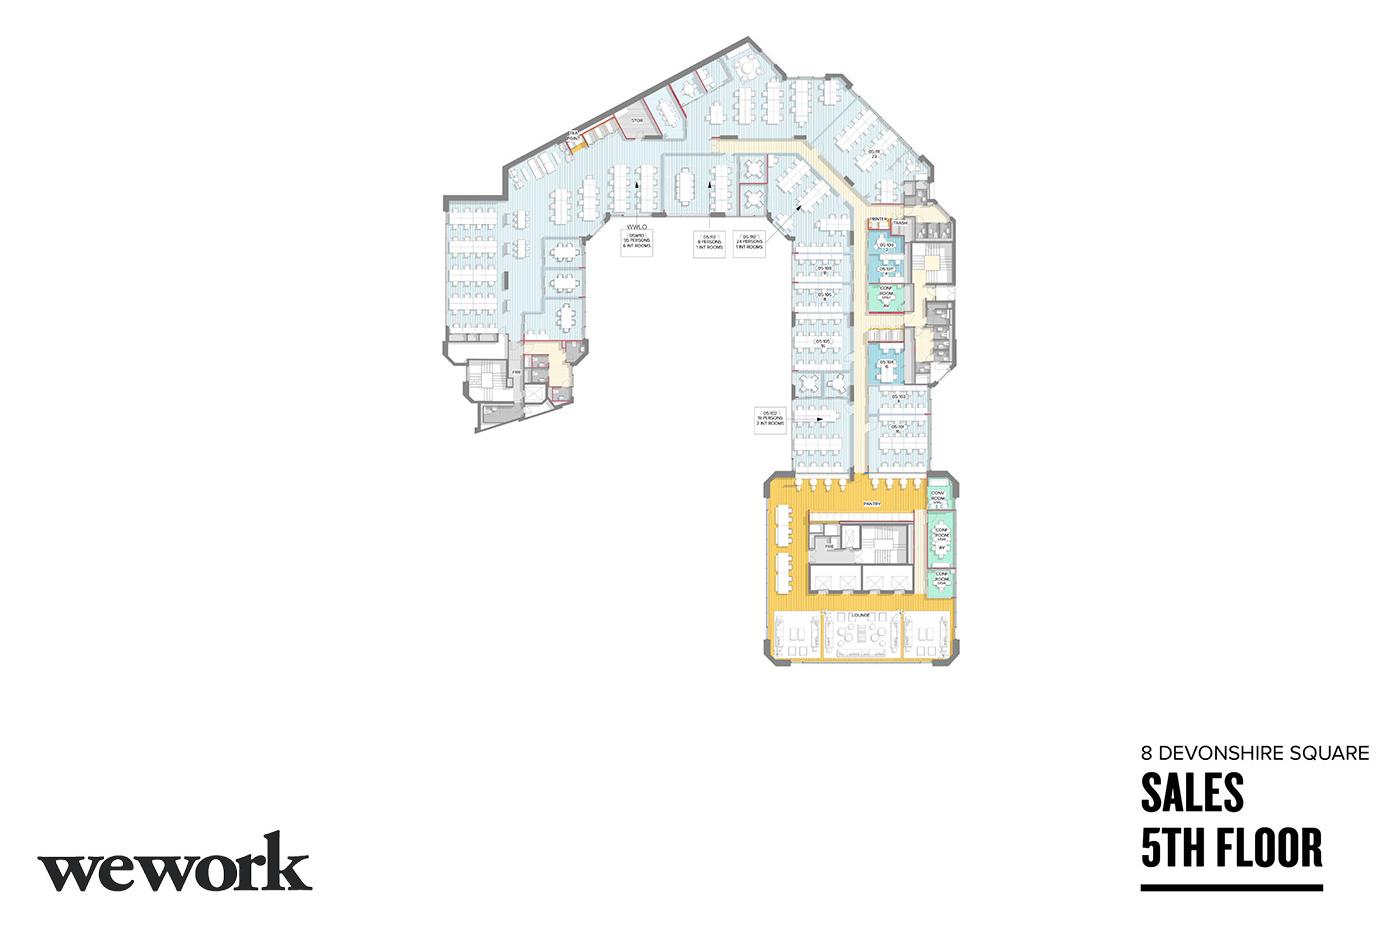 floorplans-6 copy.jpg